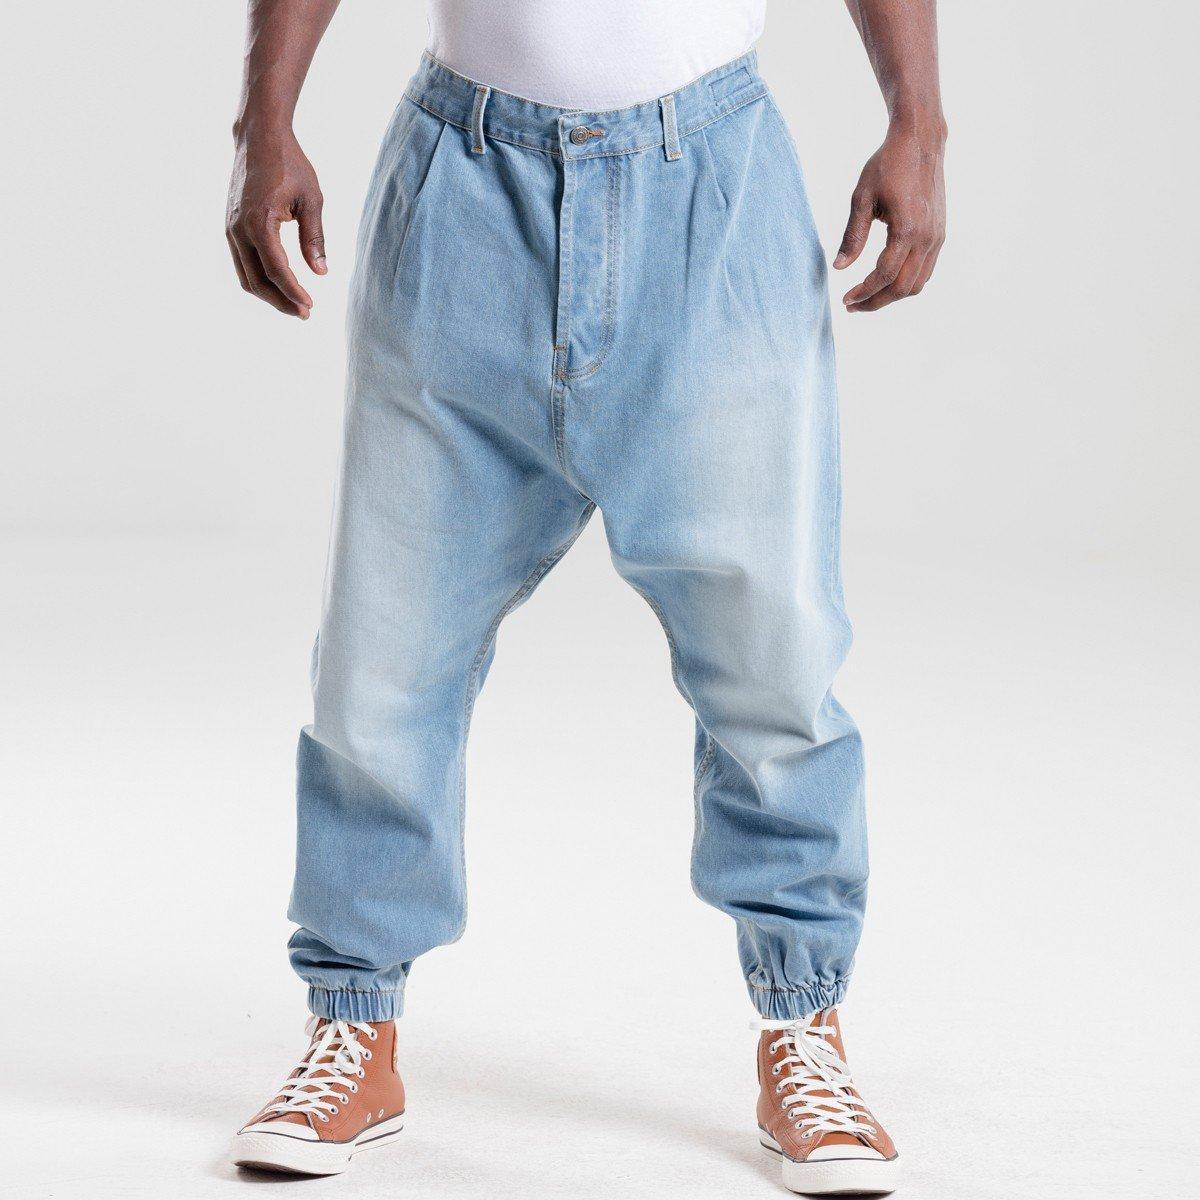 c982e36a19da8 Pantalon Jeans BLITCH used usual fit Exclu - DCJeans ® - sarouel ...